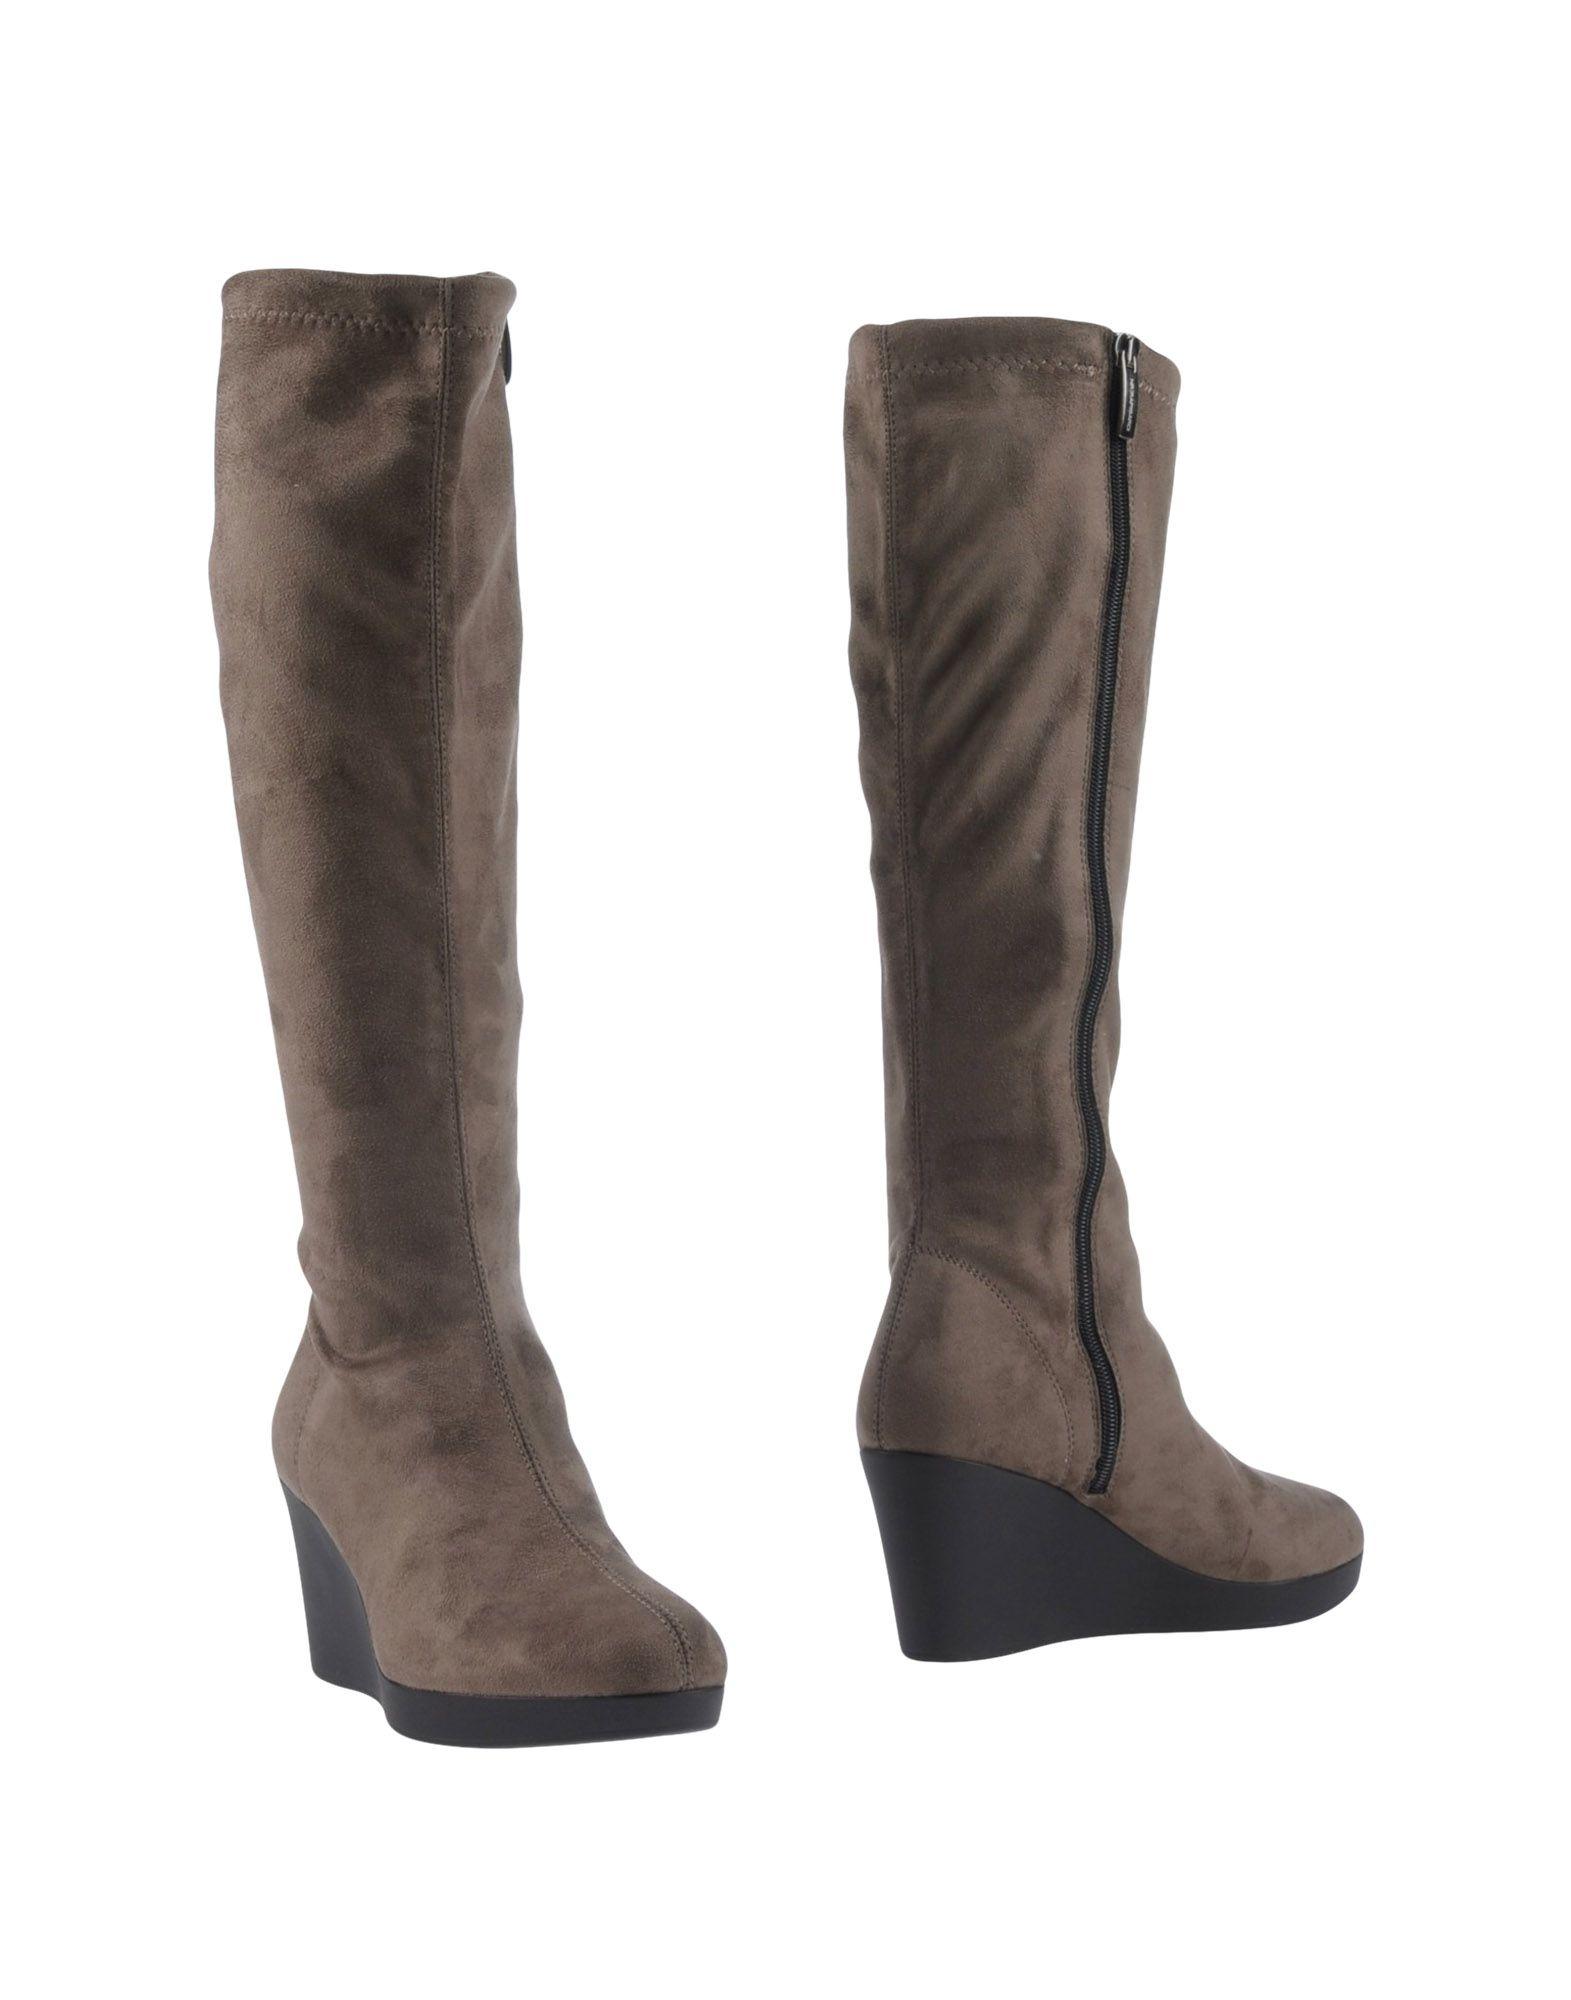 Gut um billige Schuhe Damen zu tragenNr Rapisardi Stiefel Damen Schuhe  11048475FQ d744a7